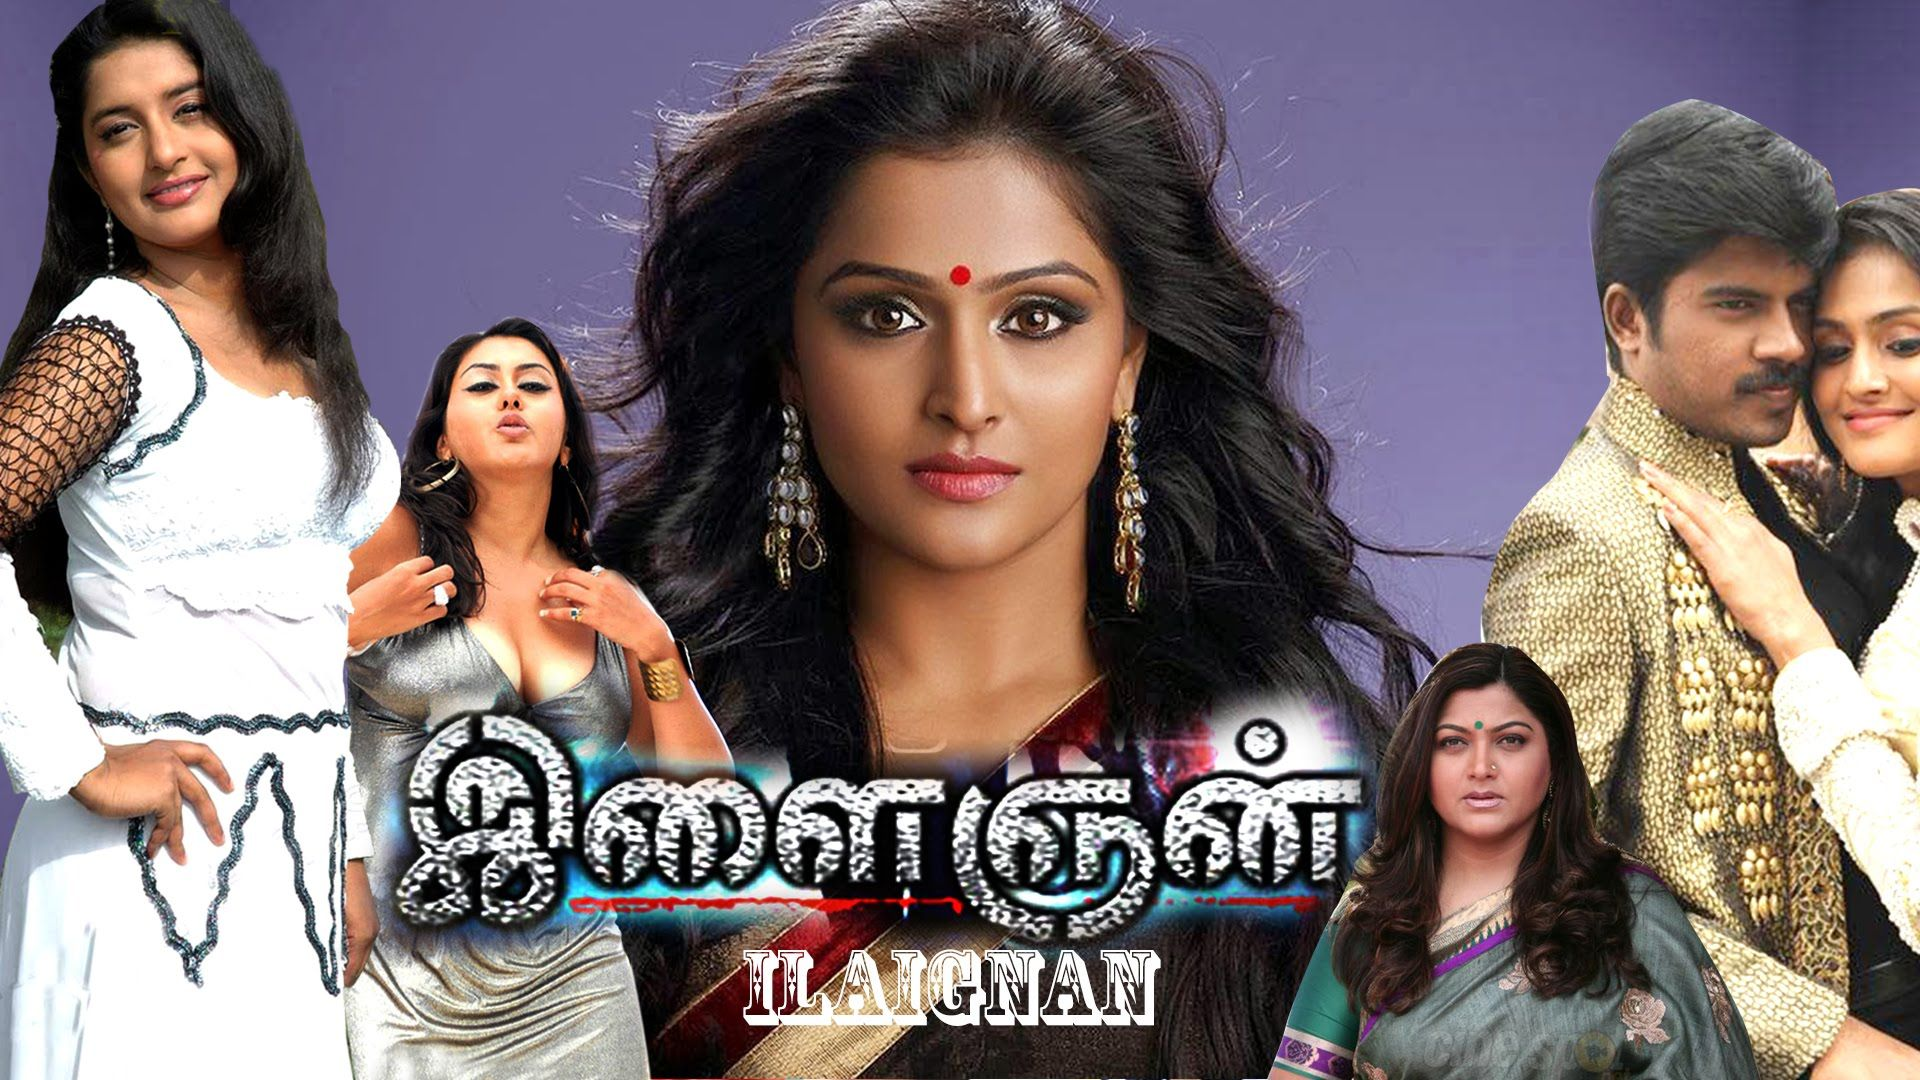 #Baahubali #Thebeginning (2015) New #TamilMovie Mp3 Songs Download Free  Baahubali (